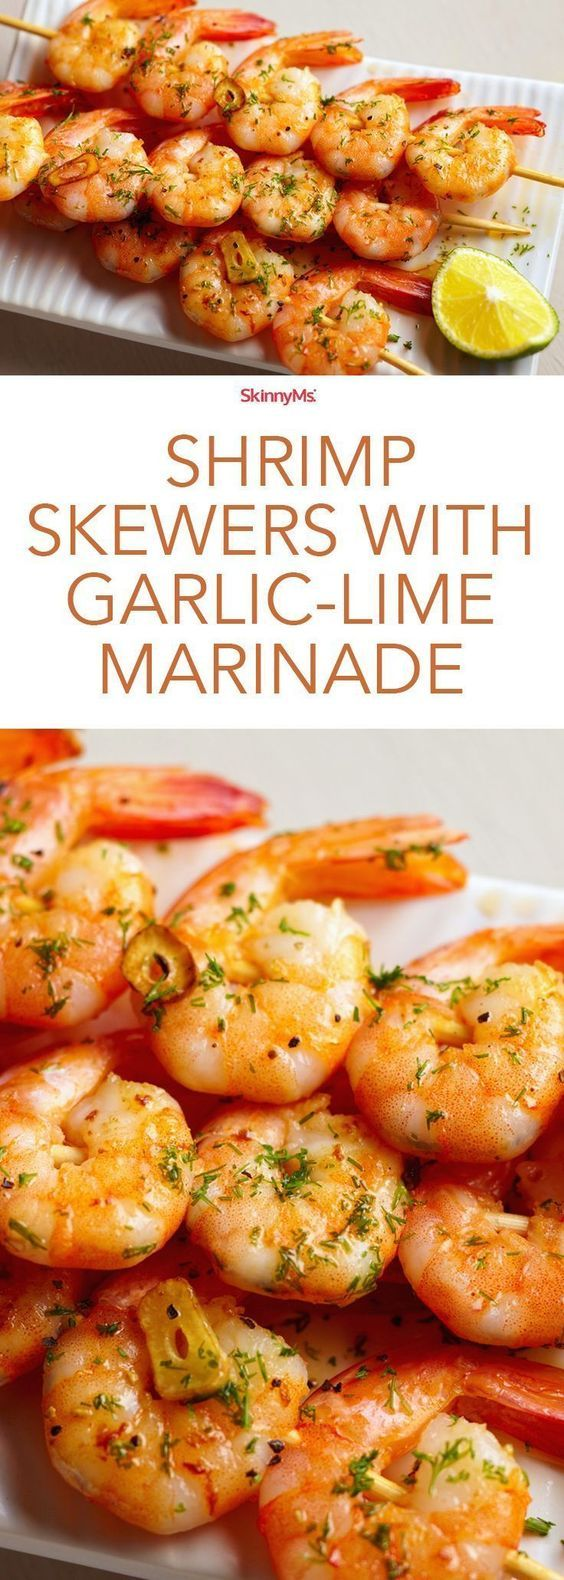 Shrimp Skewers with Garlic-Lime Marinade